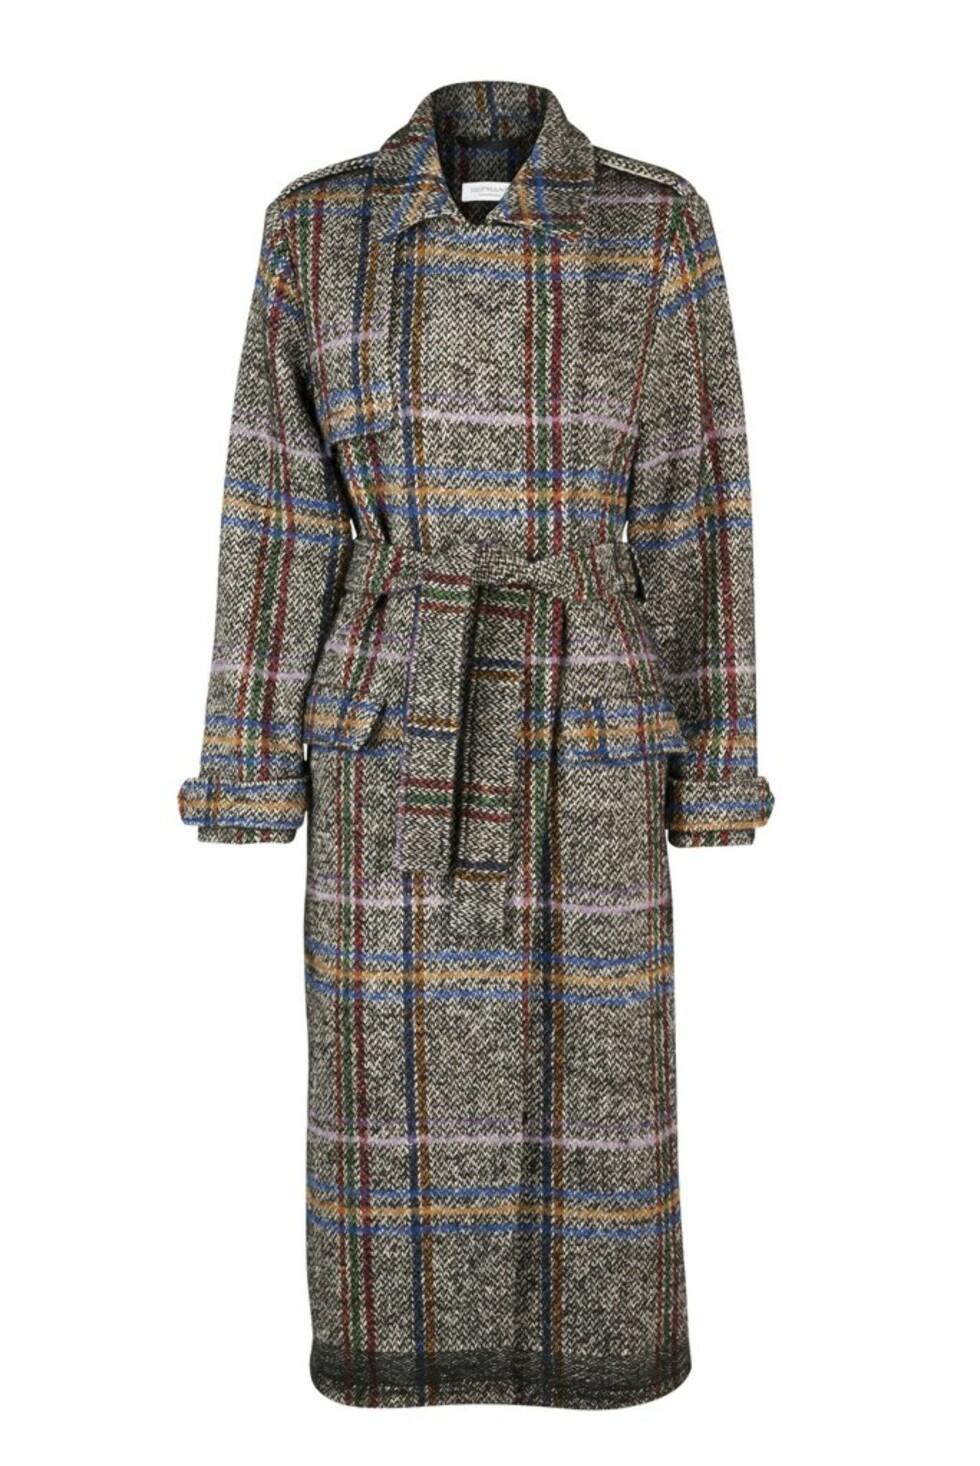 Jakke fra Hofmann Copenhagen  3799,-  https://hofmanncopenhagen.com/collections/jackets-2/products/tilly-wool-coat-black